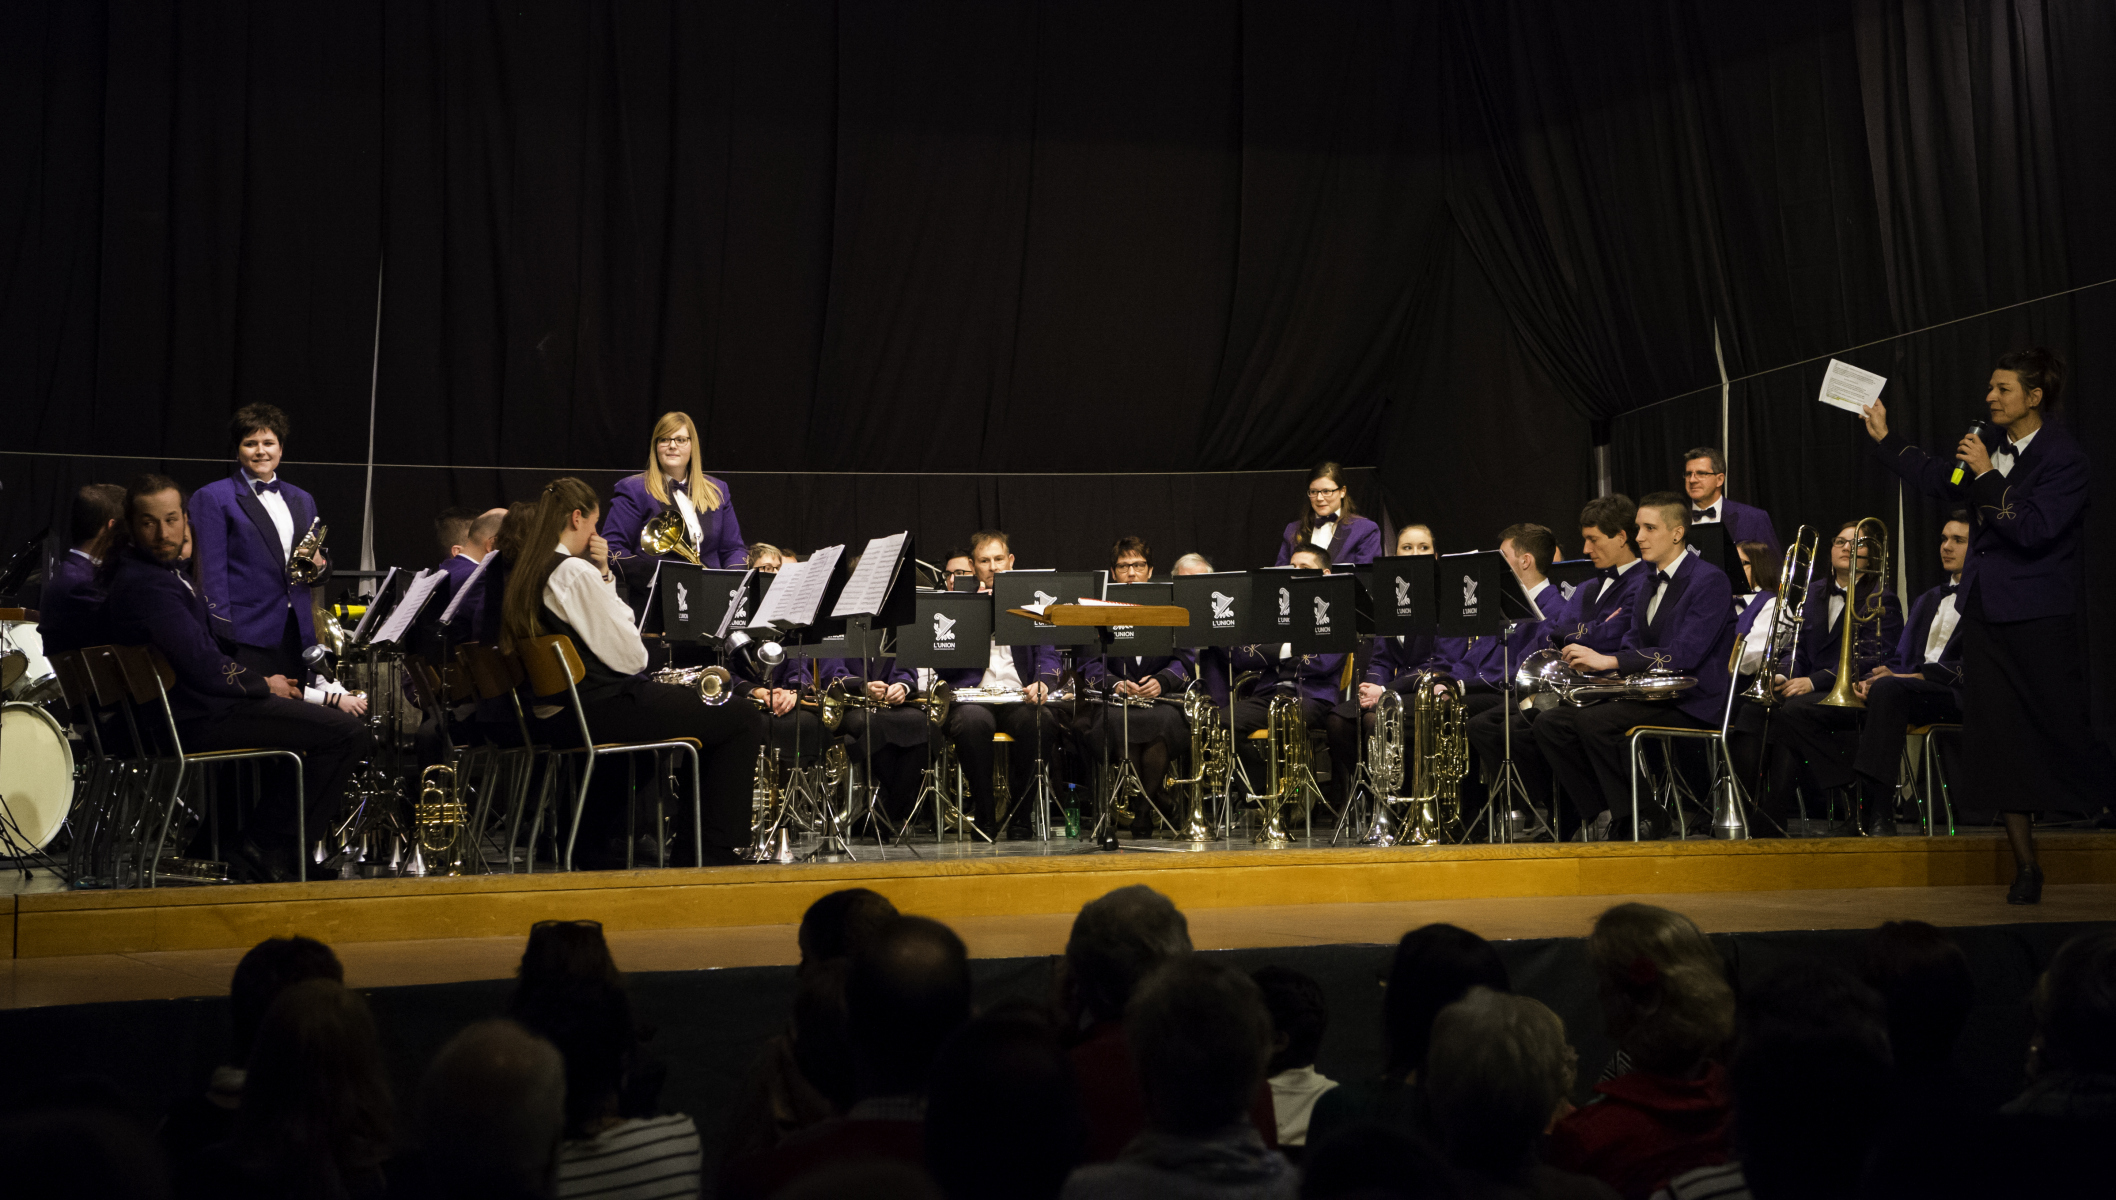 170211_concert_annuel17-059